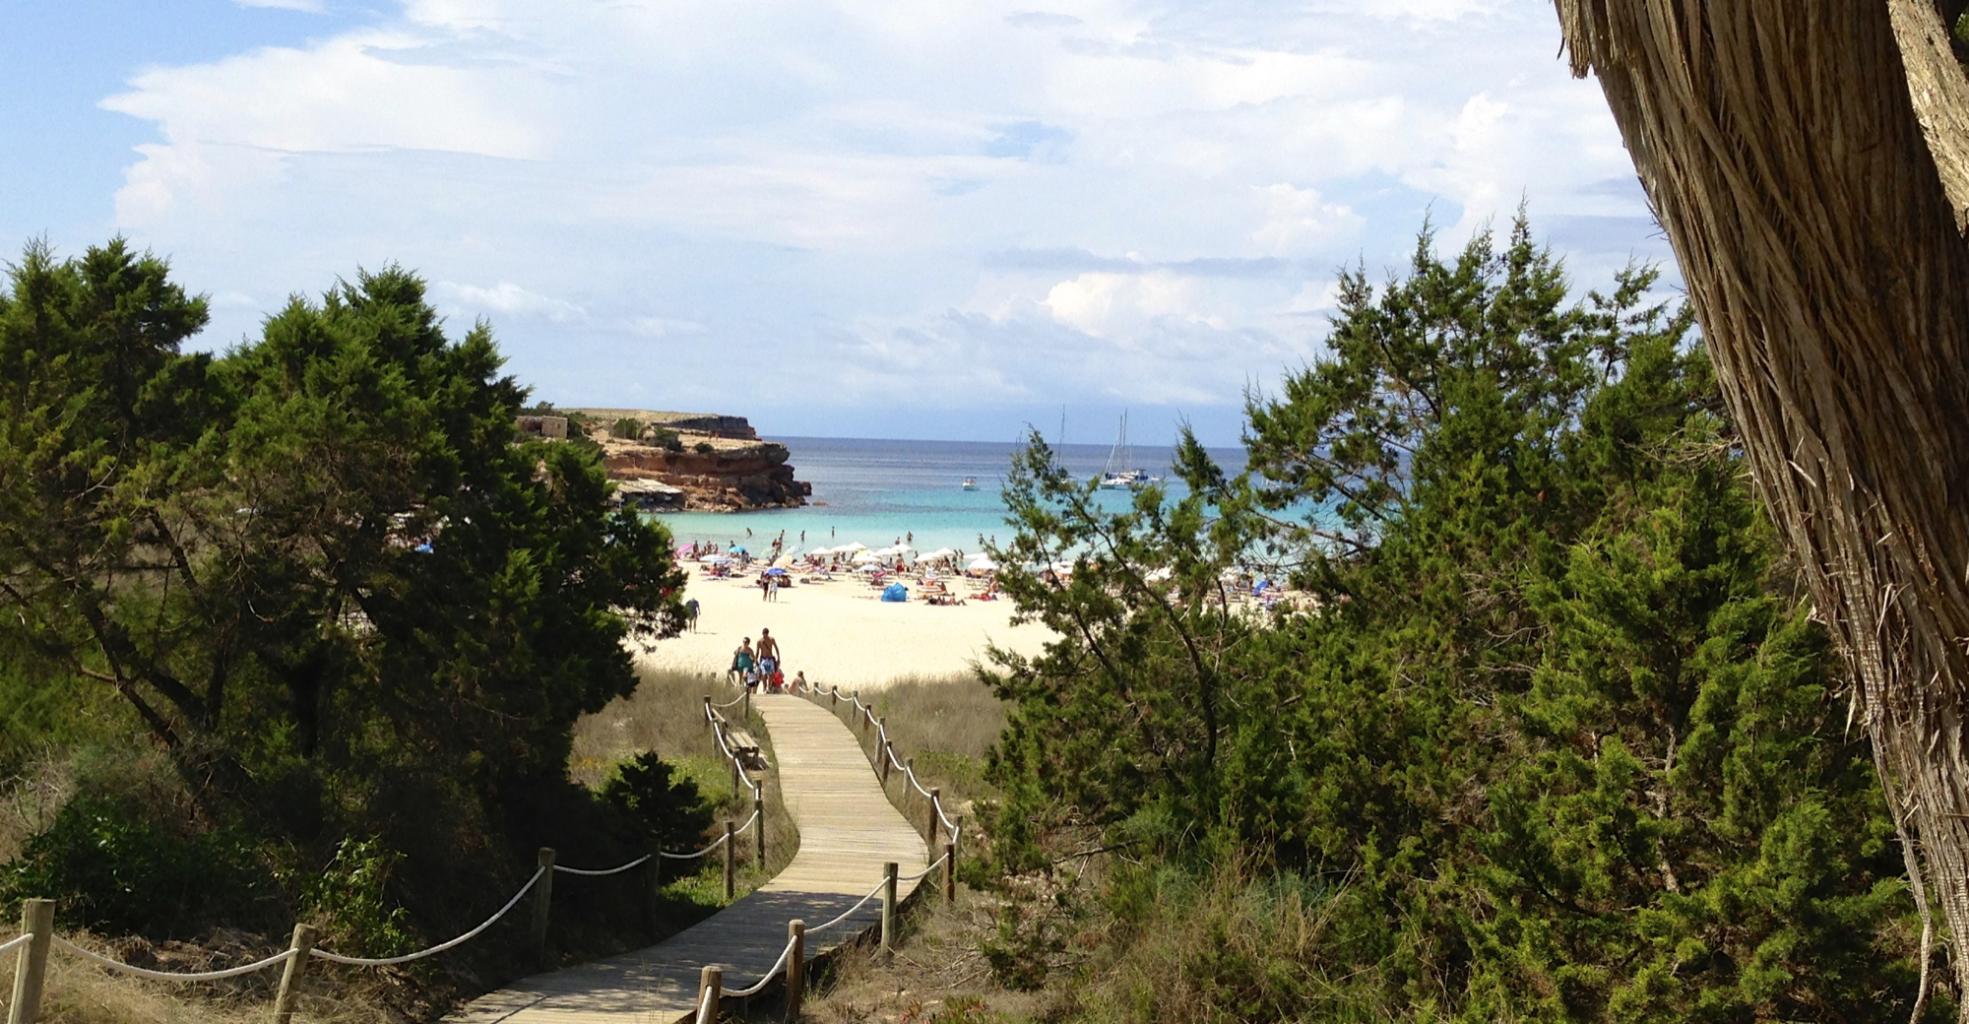 Formentera Playa Cala Saona - 1